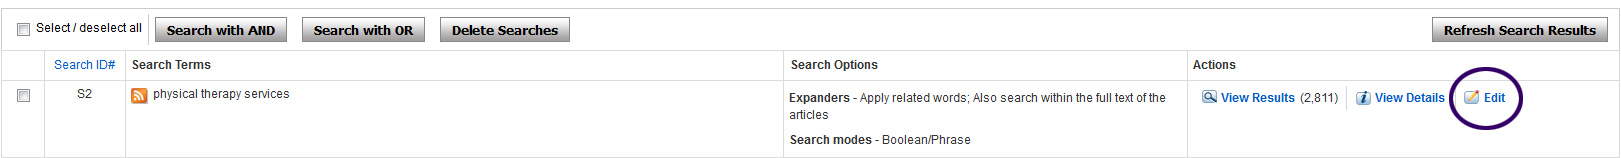 screenshot of EBSCO Host search history menu